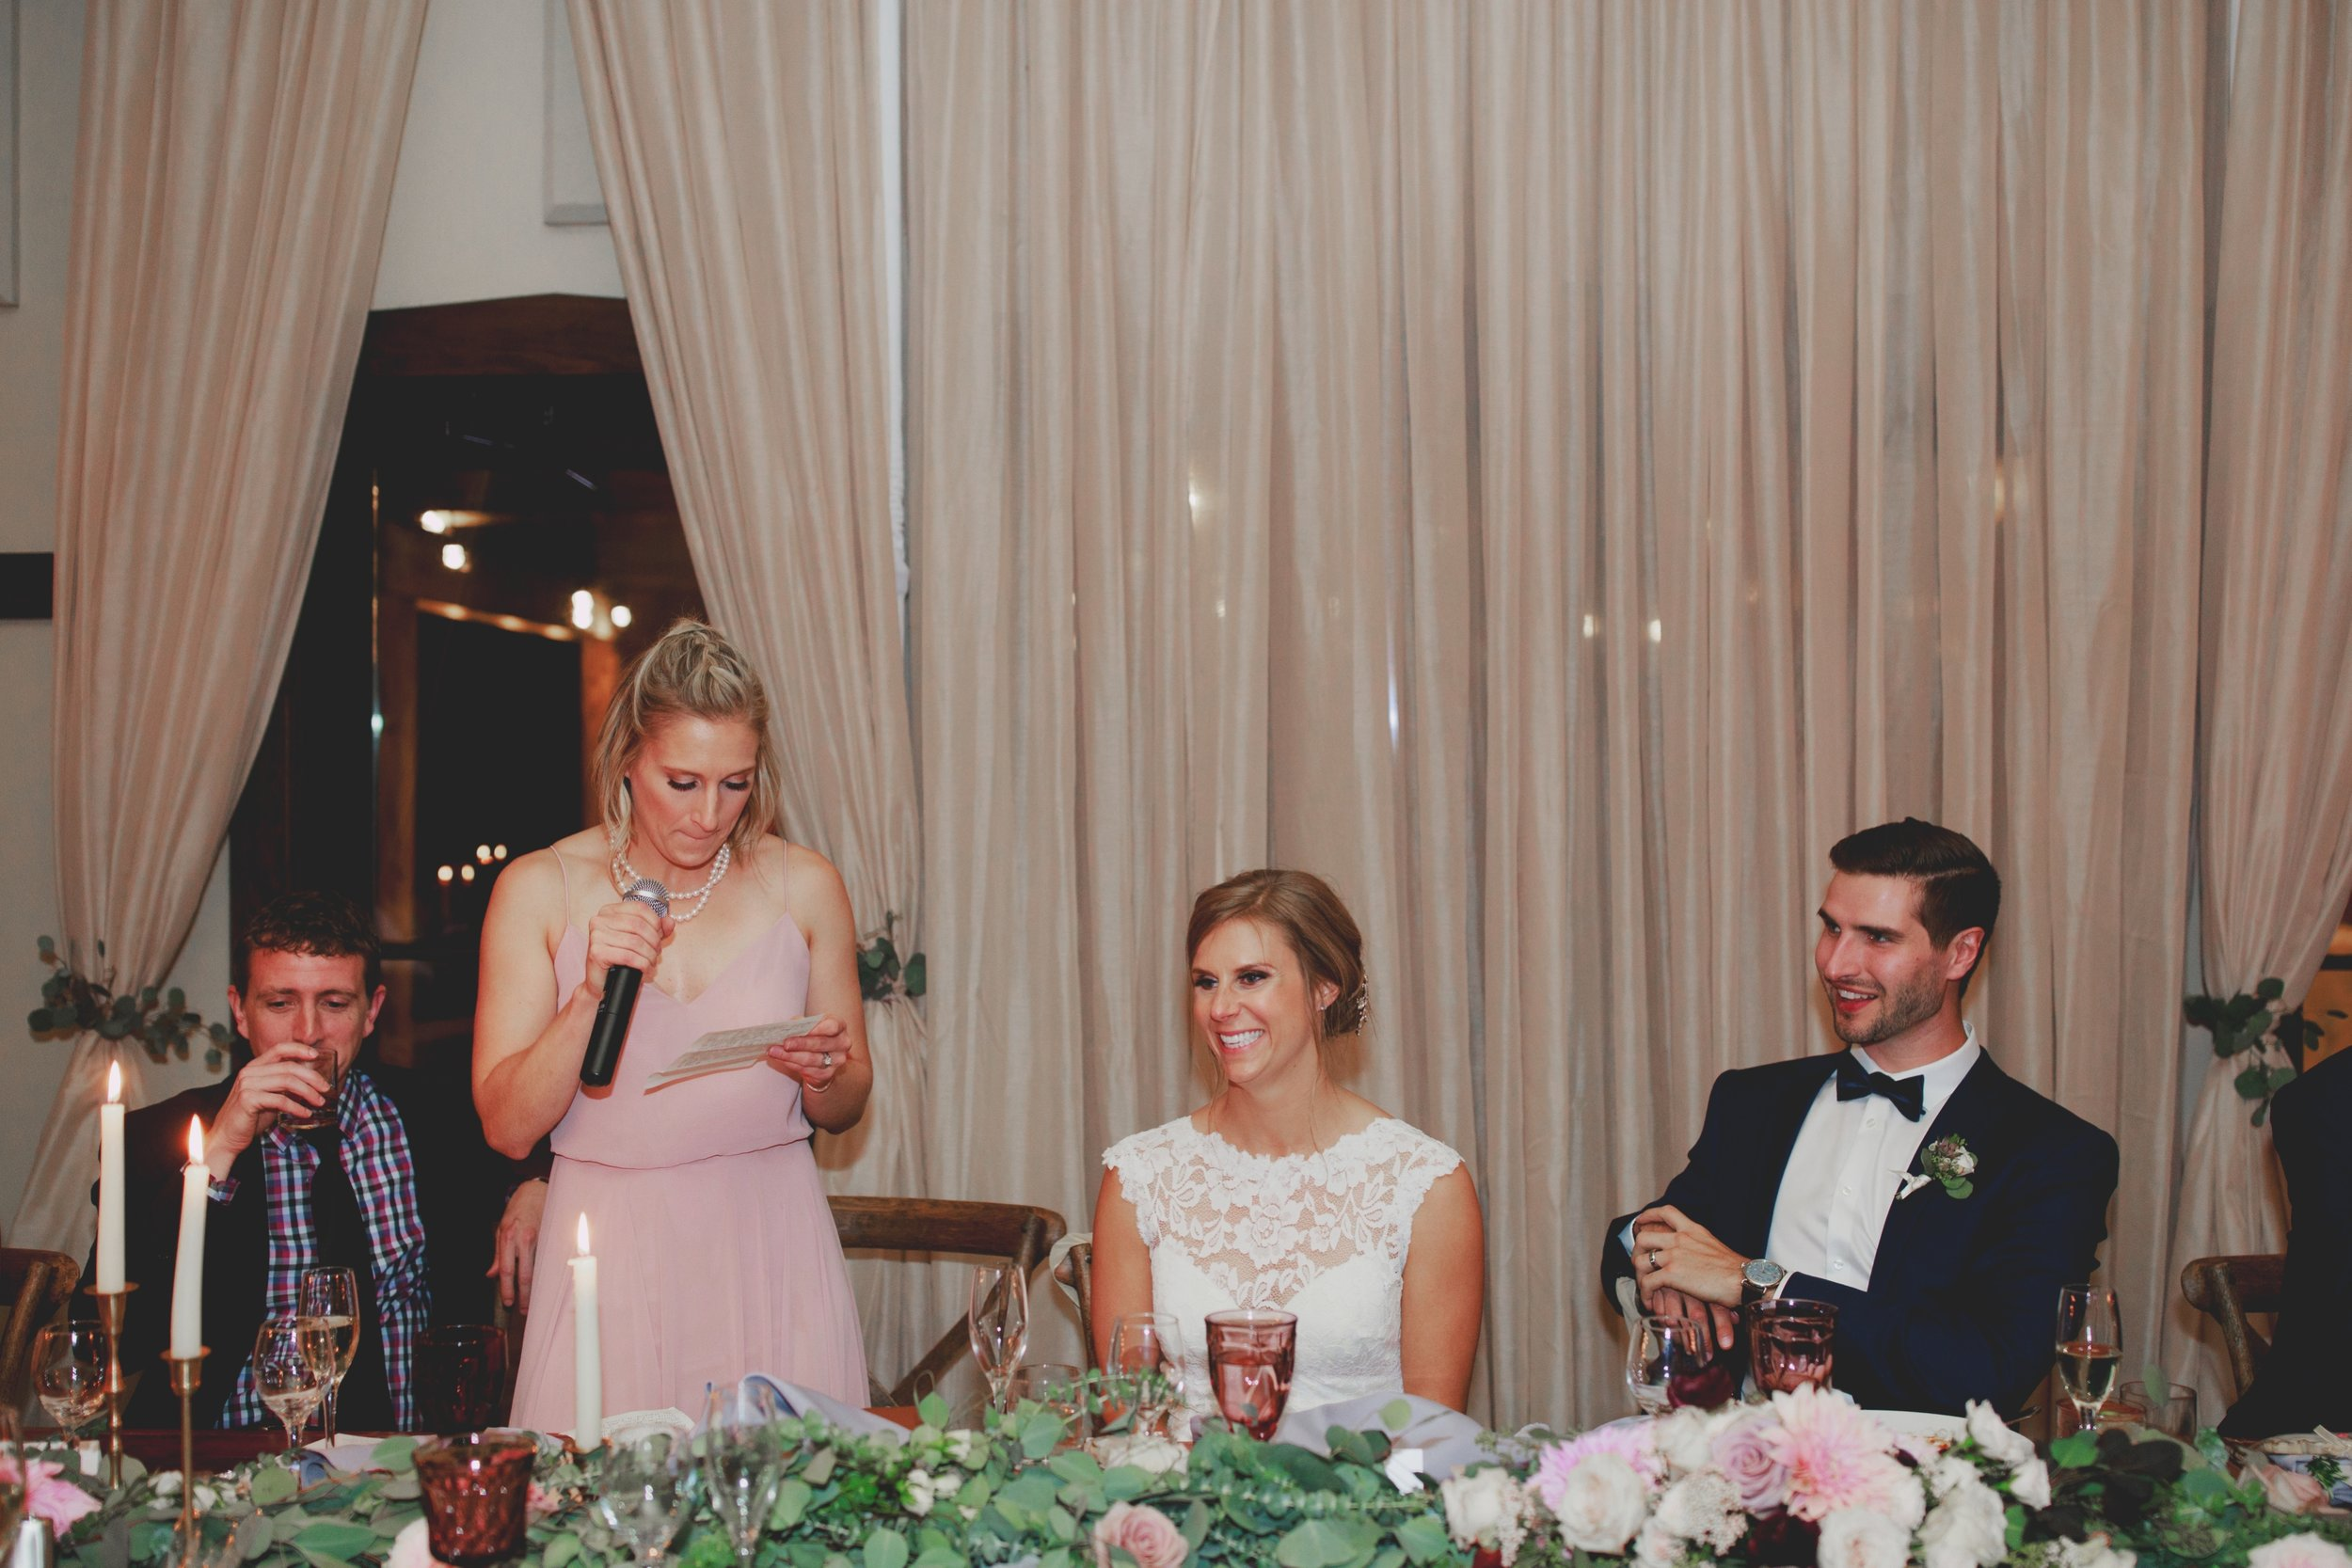 traverse_city_wedding_151.jpg